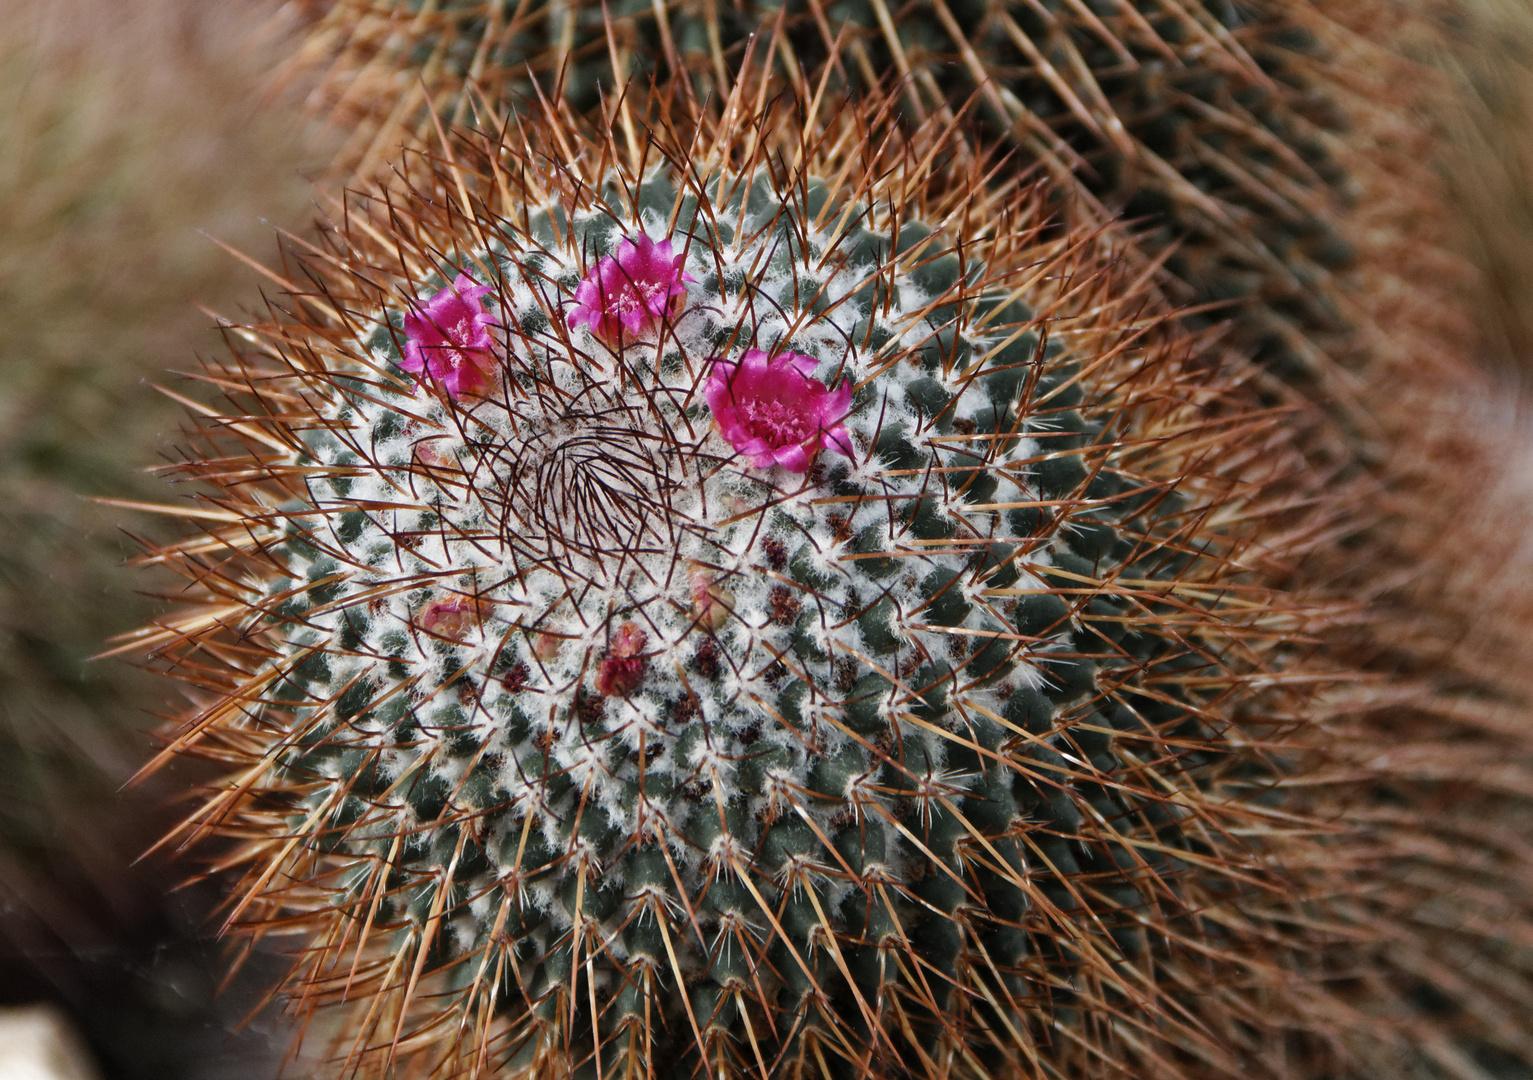 Blütenschutz aus Stacheln